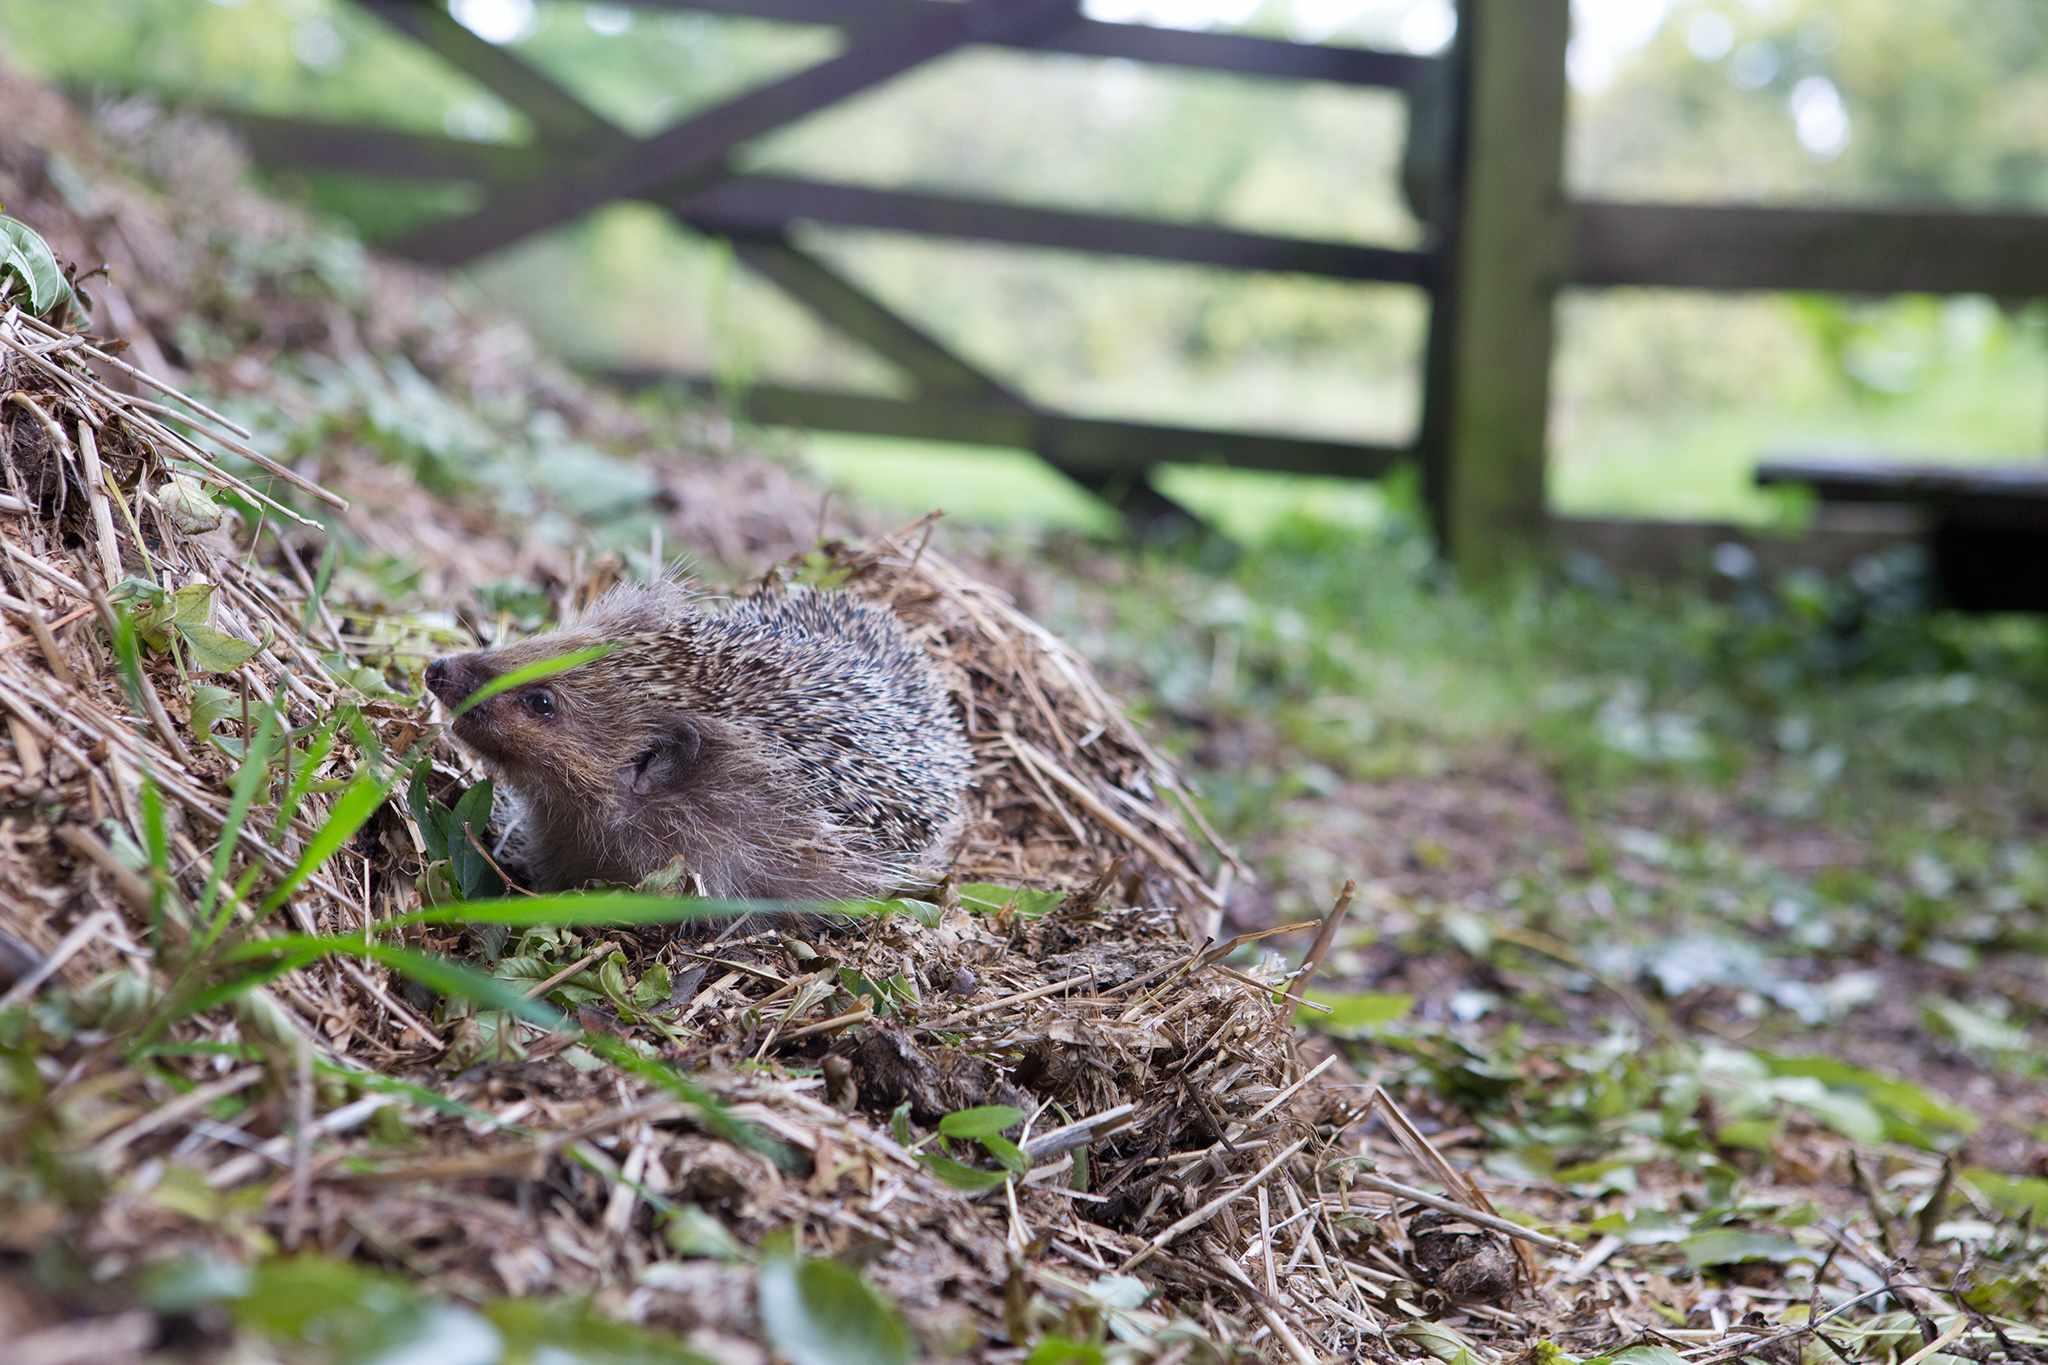 Hedgehog and compost heap